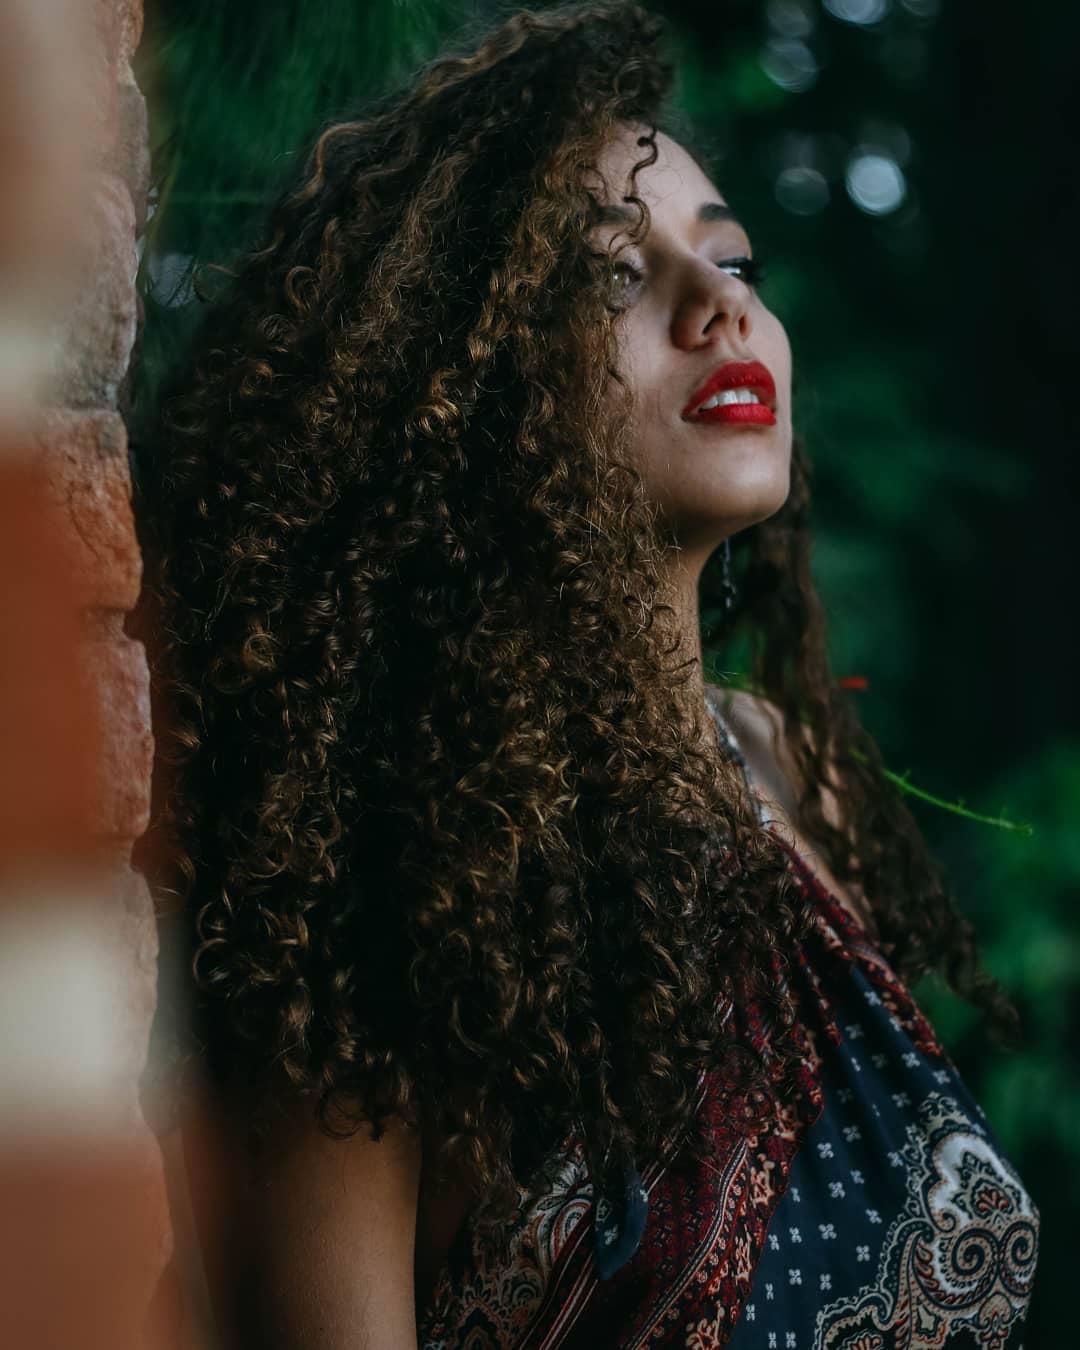 lara goncalves, miss agulhas negras mundo 2018. - Página 2 37726610